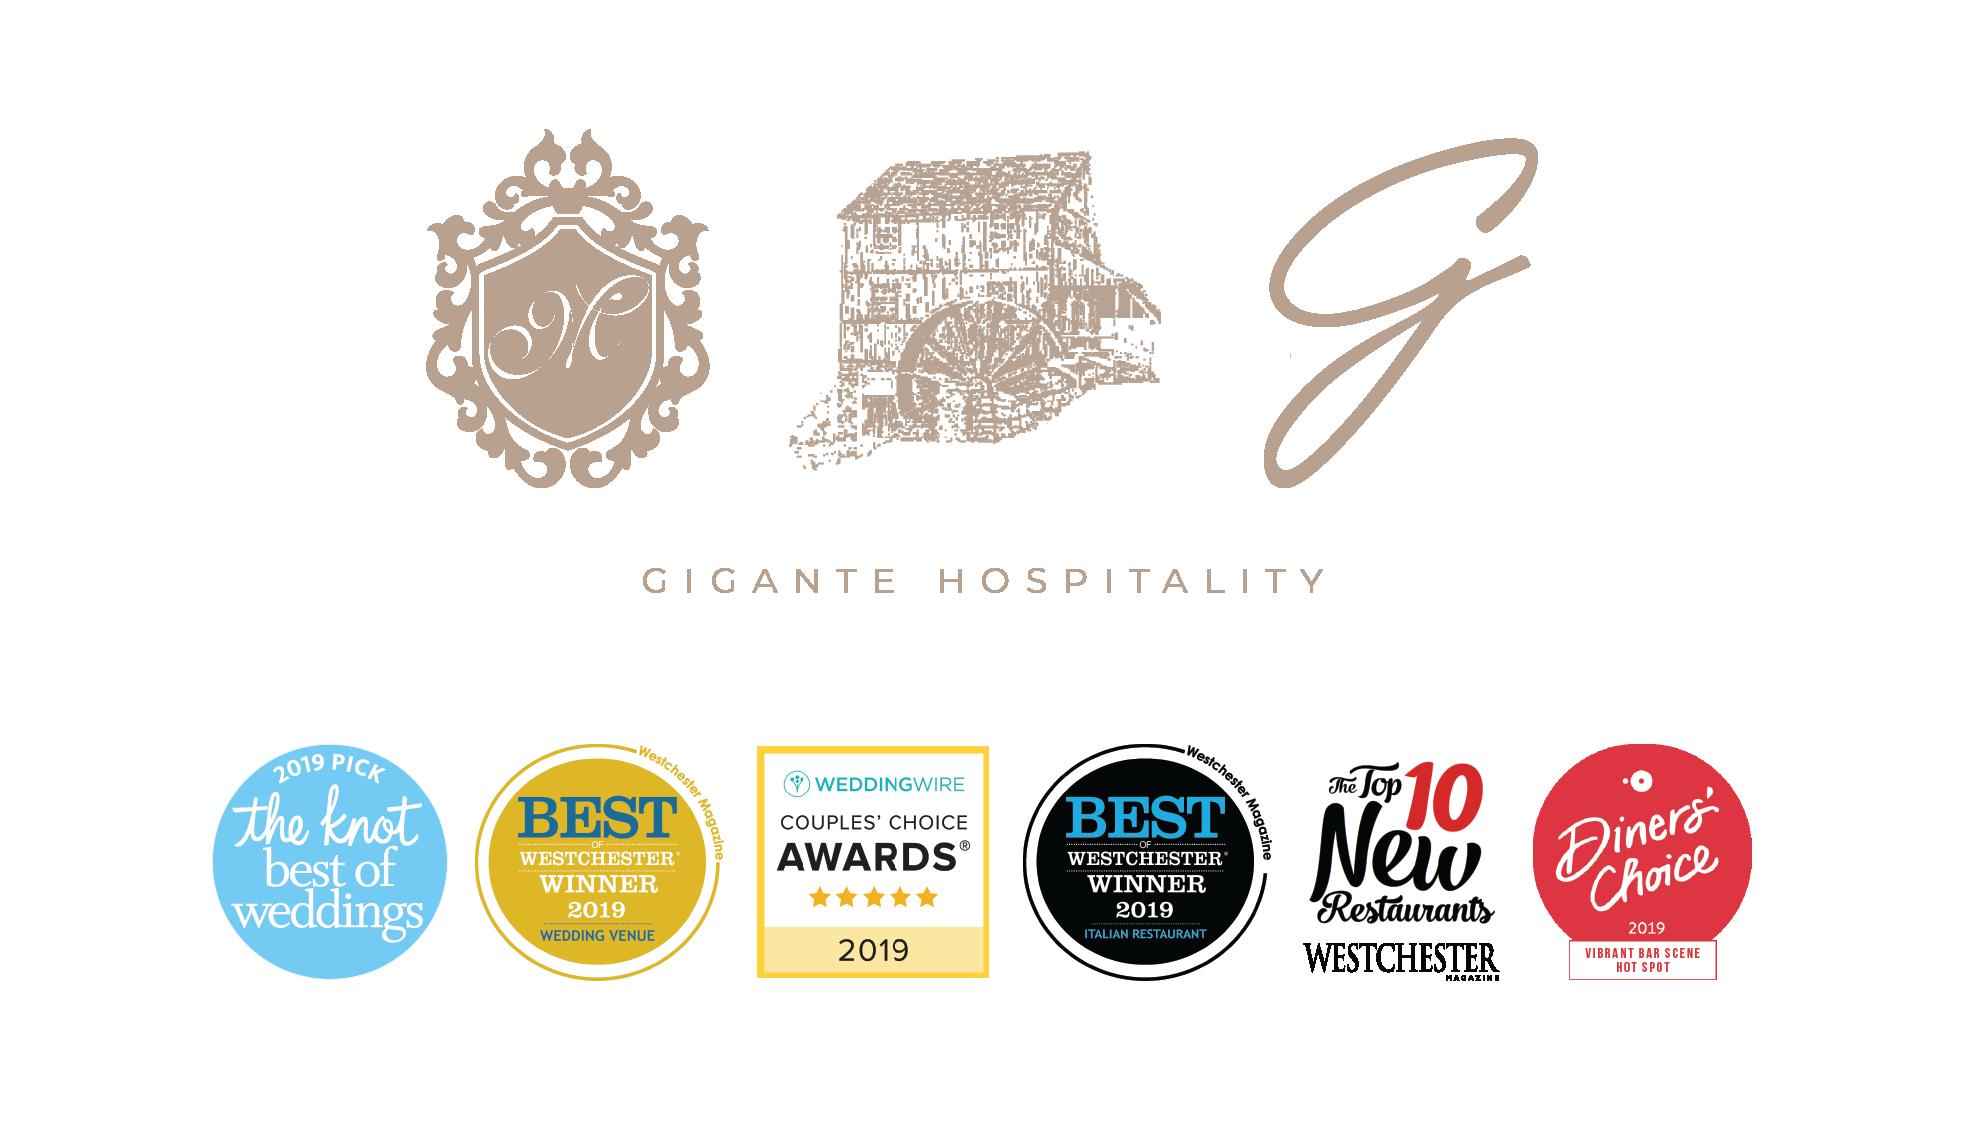 gigante hospitality header with badges.png